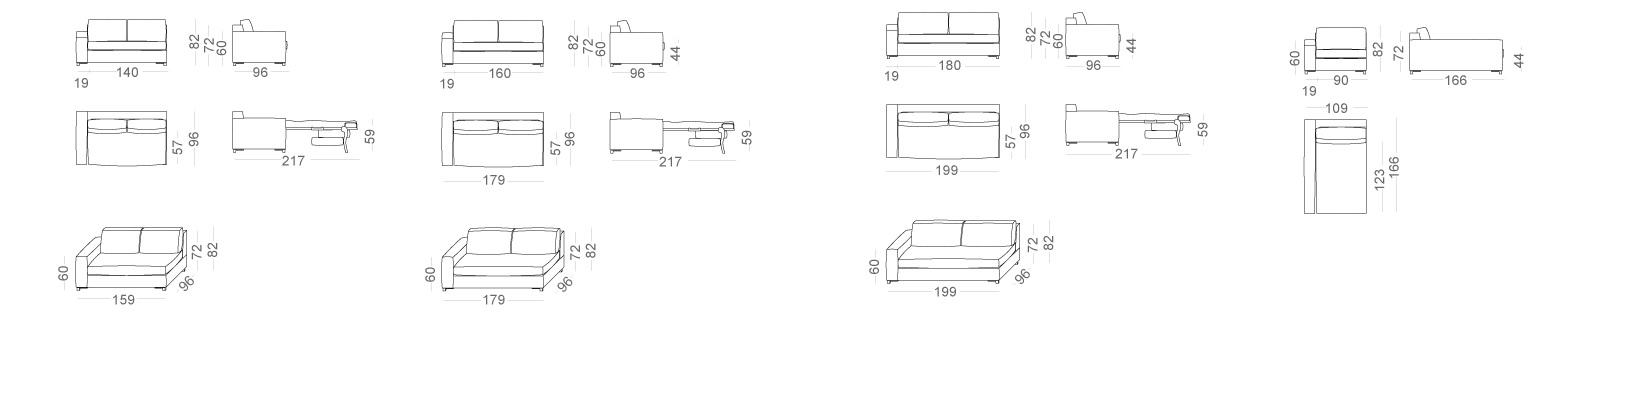 canape-convertible-angle-prince-vestibule-paris3